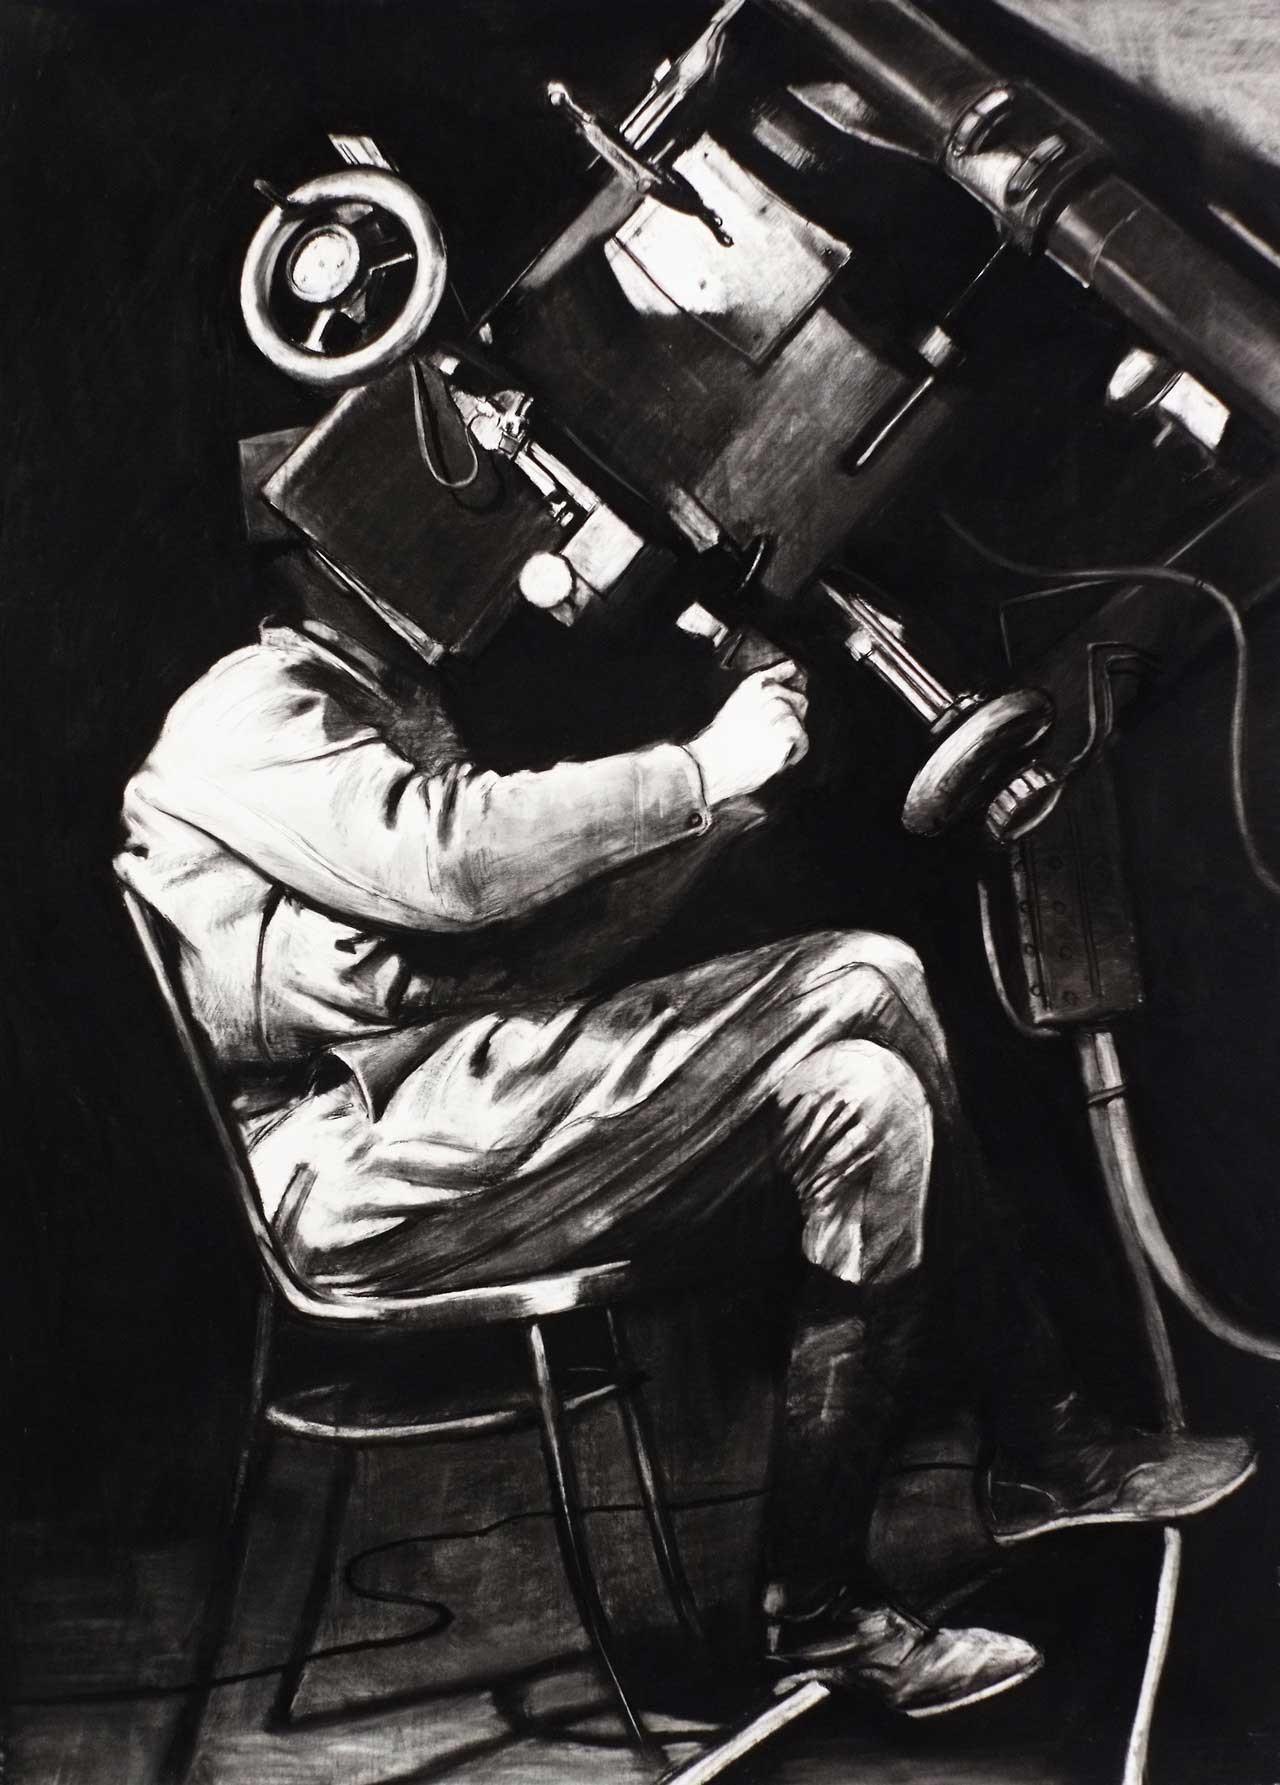 Douglas Stichbury  Observer , 2014 Charcoal on paper 1500 x 1200 mm [Winner - Parkin Drawing Prize 2014]  _______